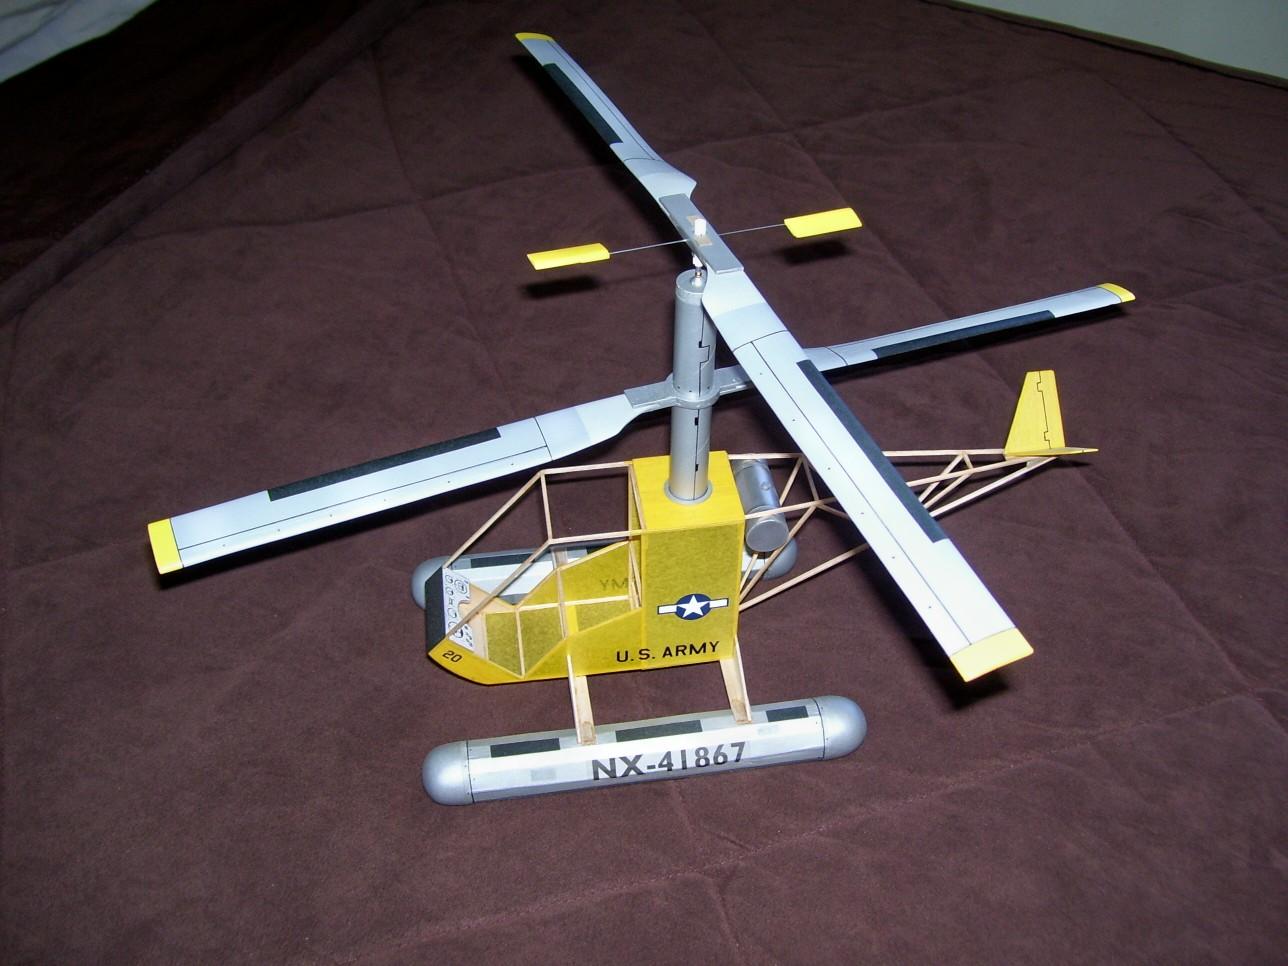 Aero_1_002.jpg